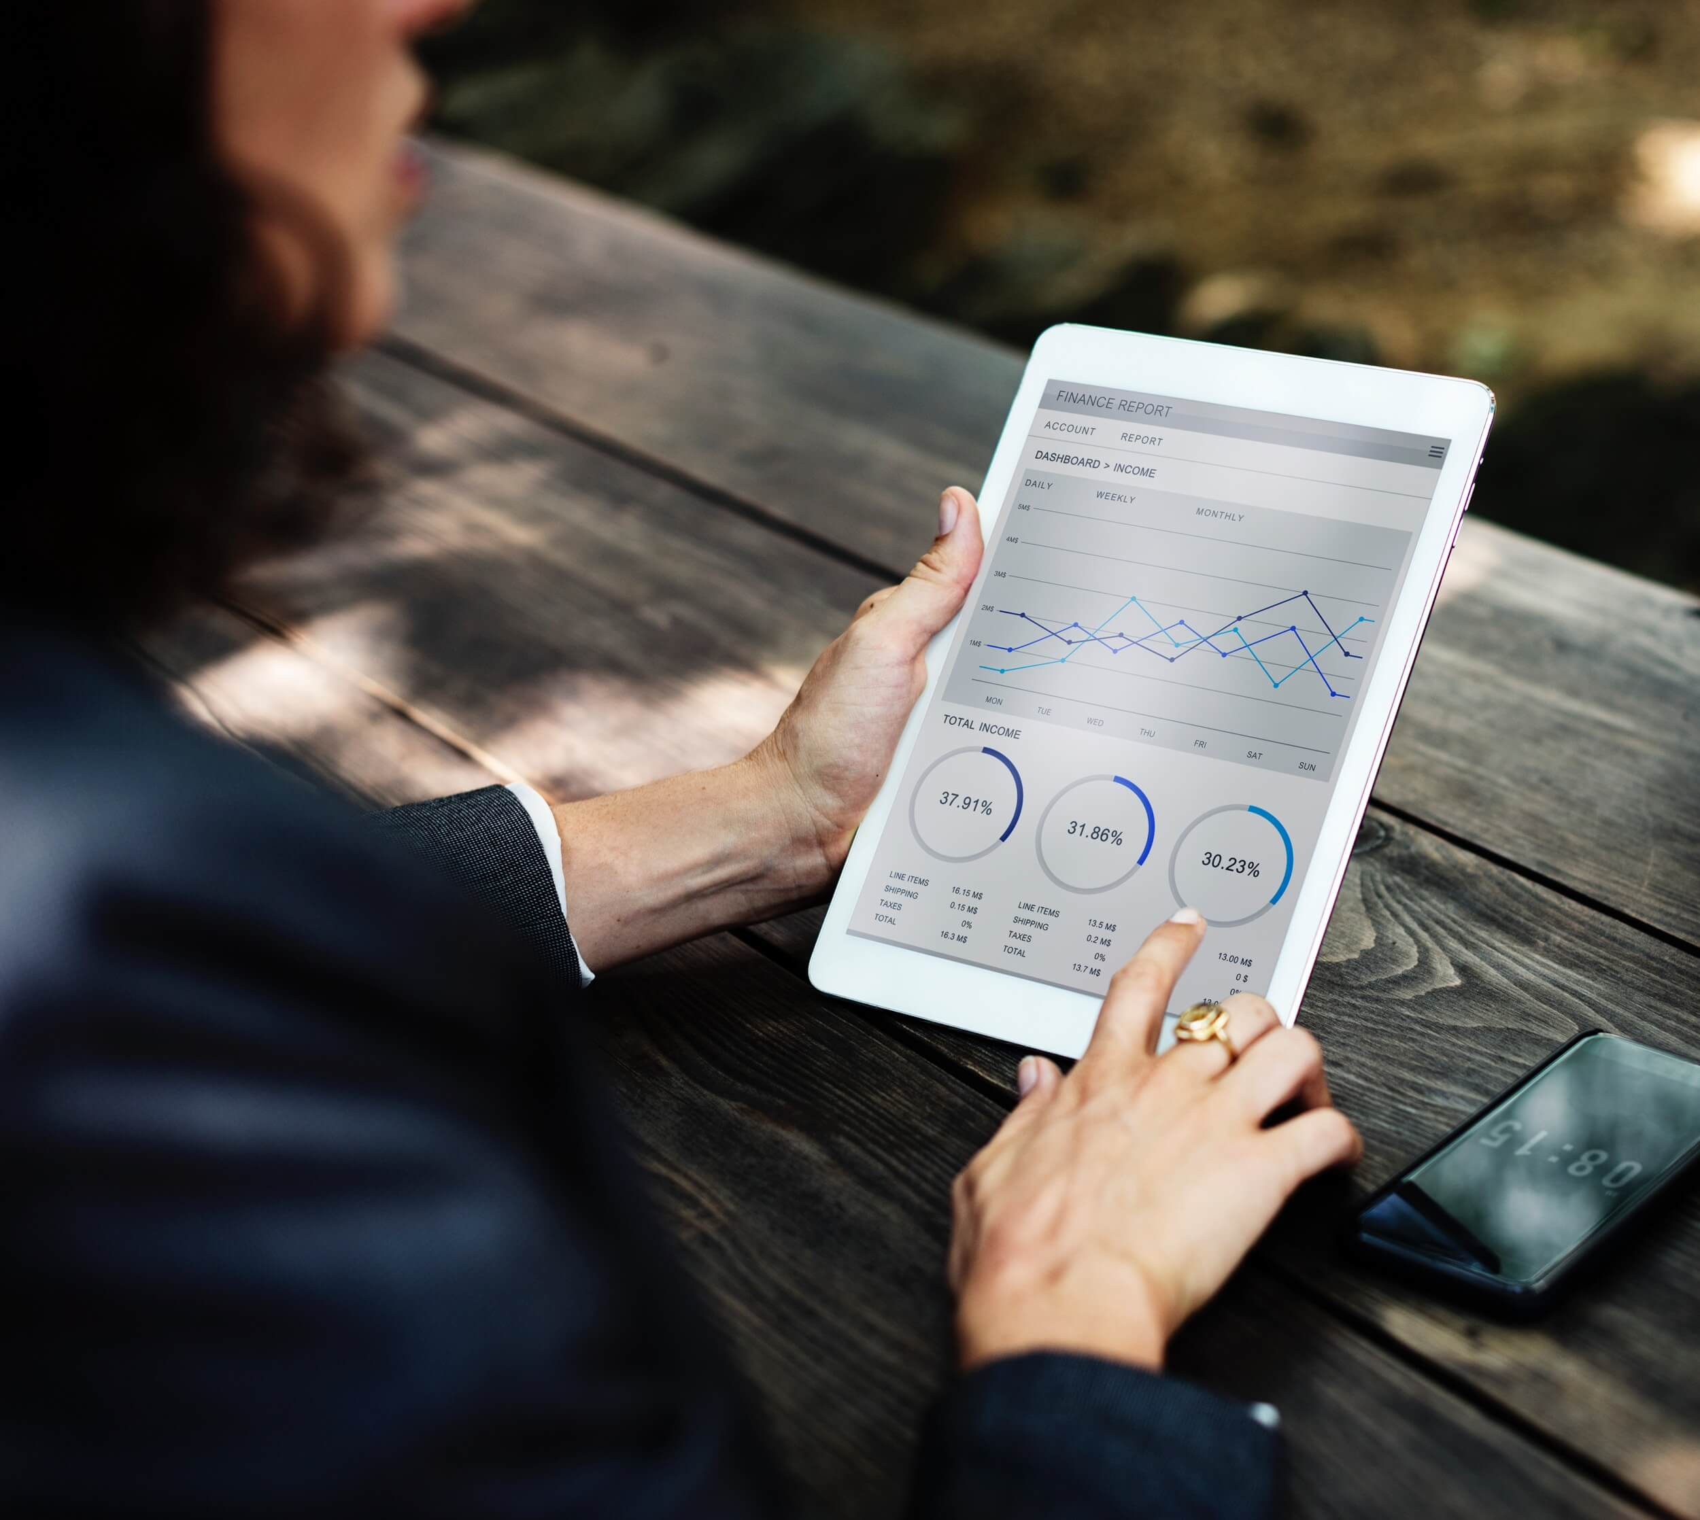 building a big data analytics platform with AWS services